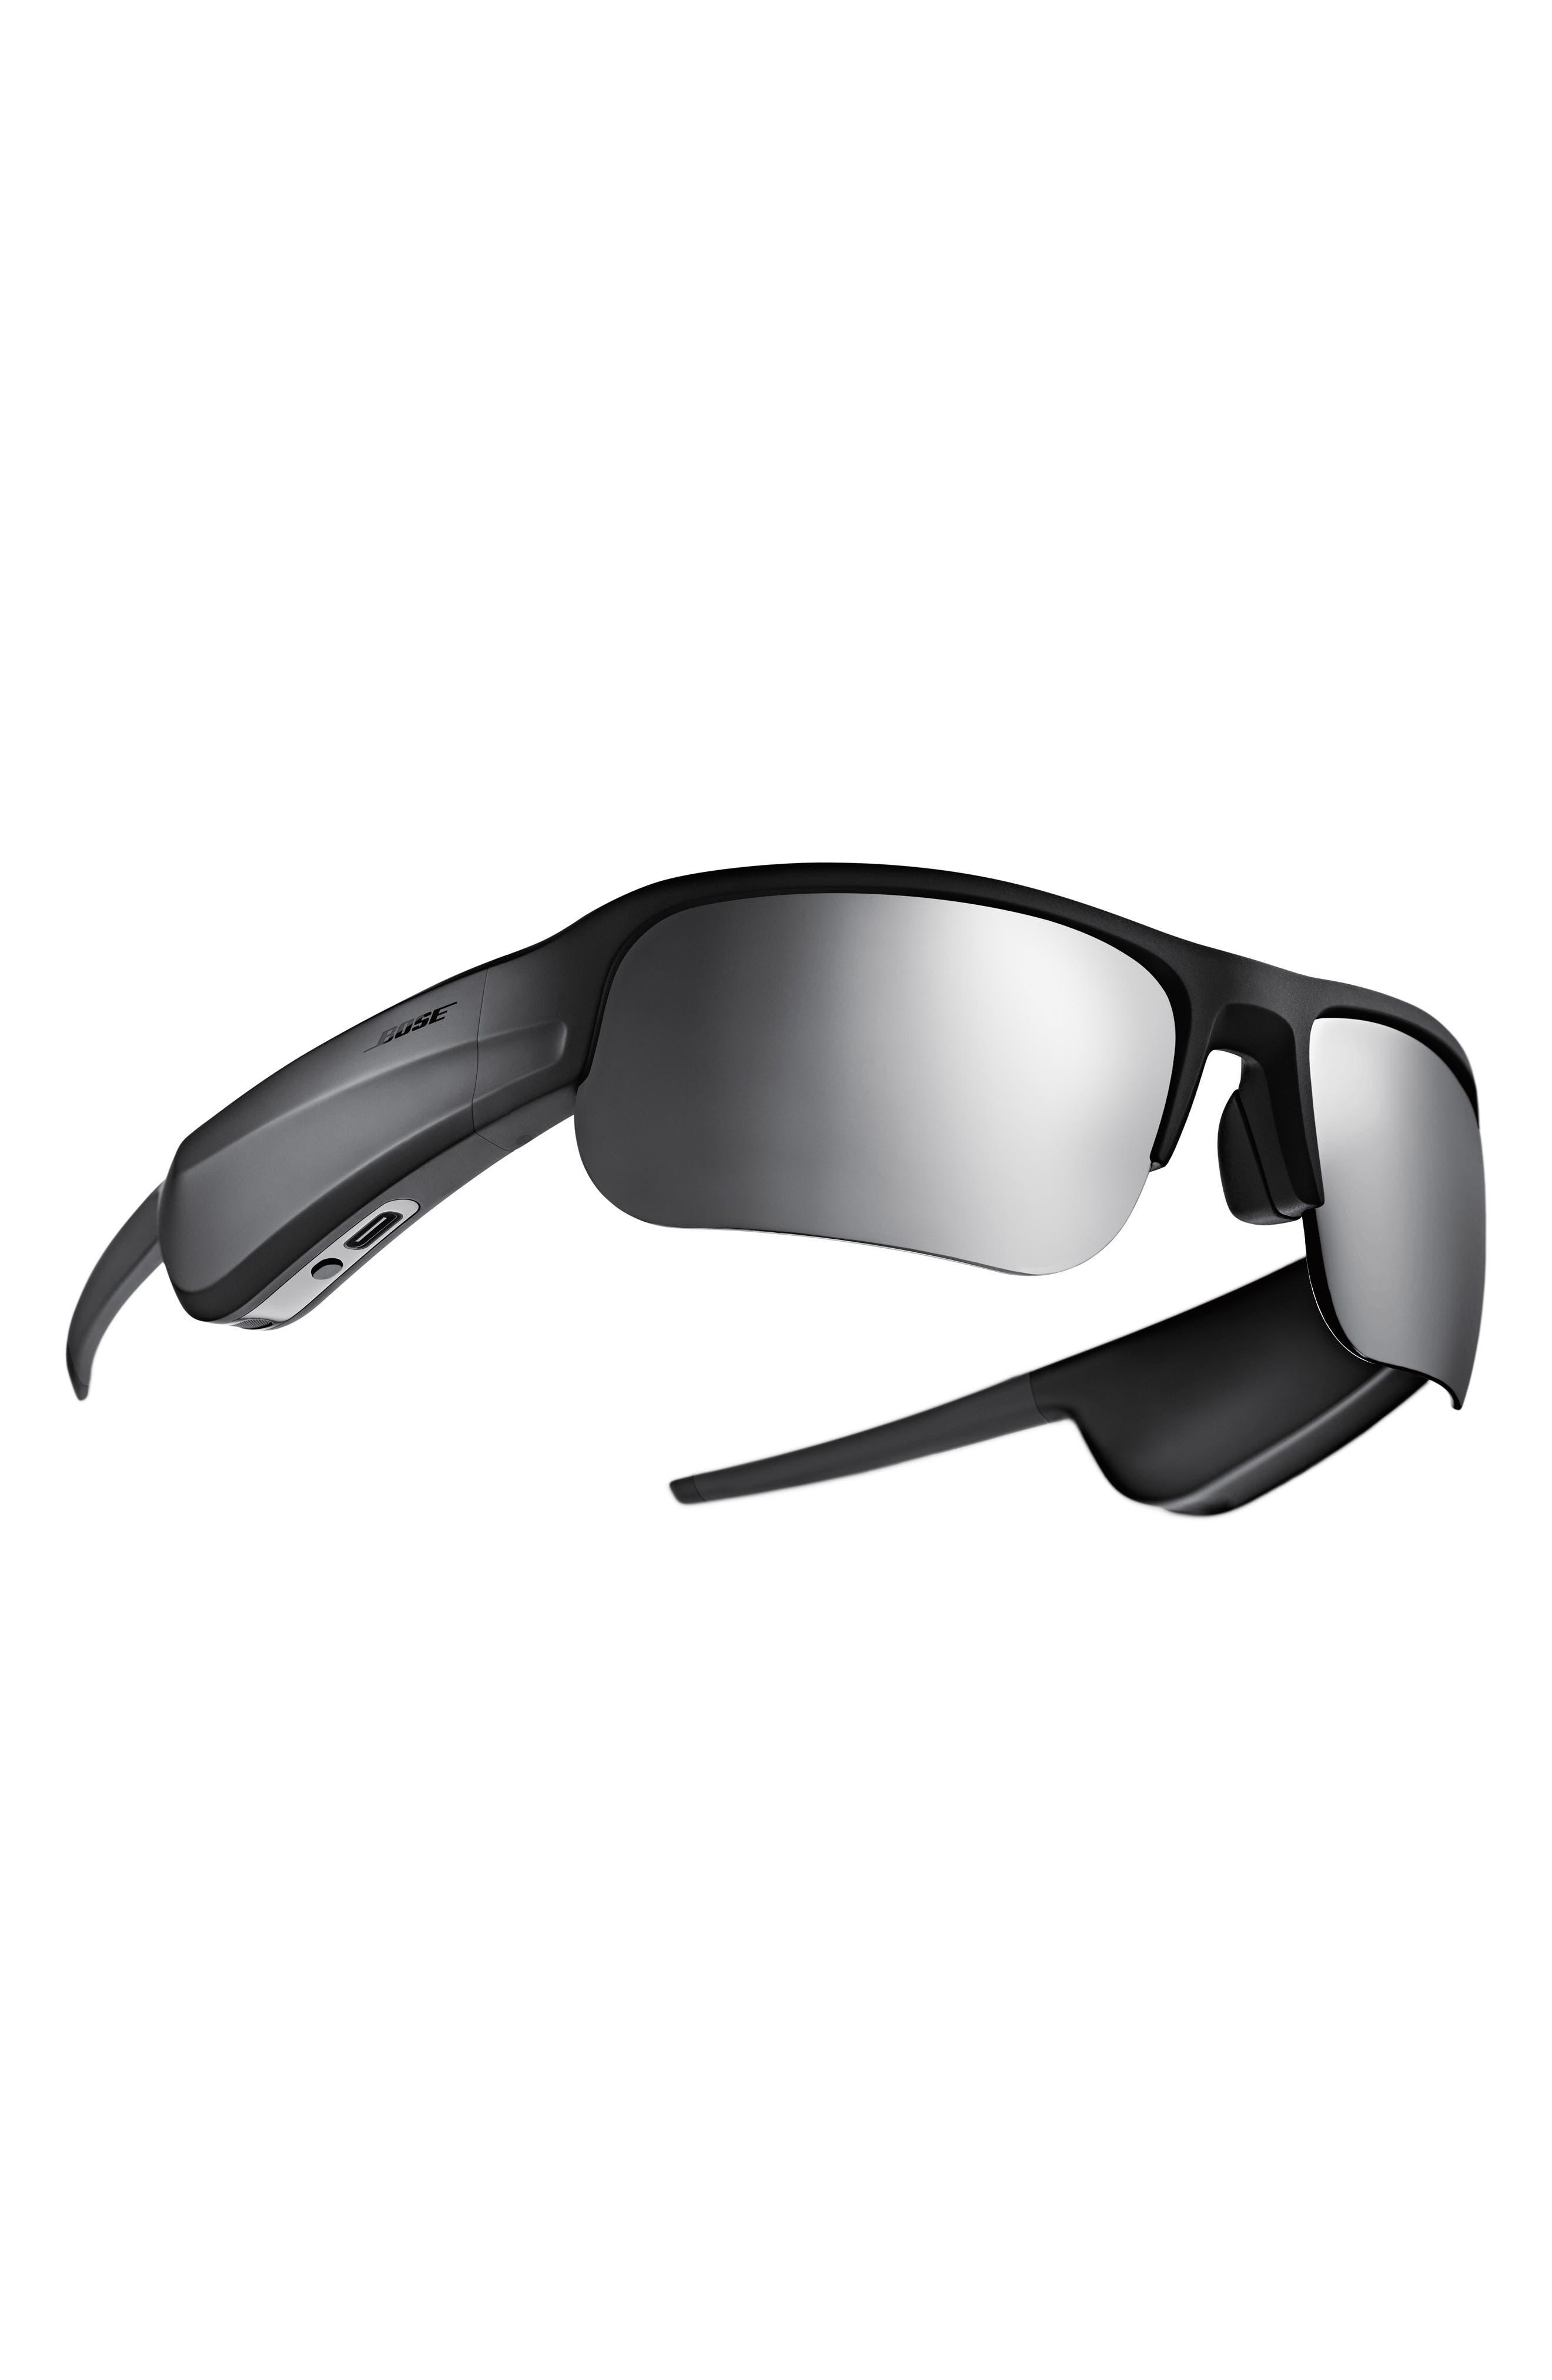 Men's Bose Frames Tempo Audio Sunglasses